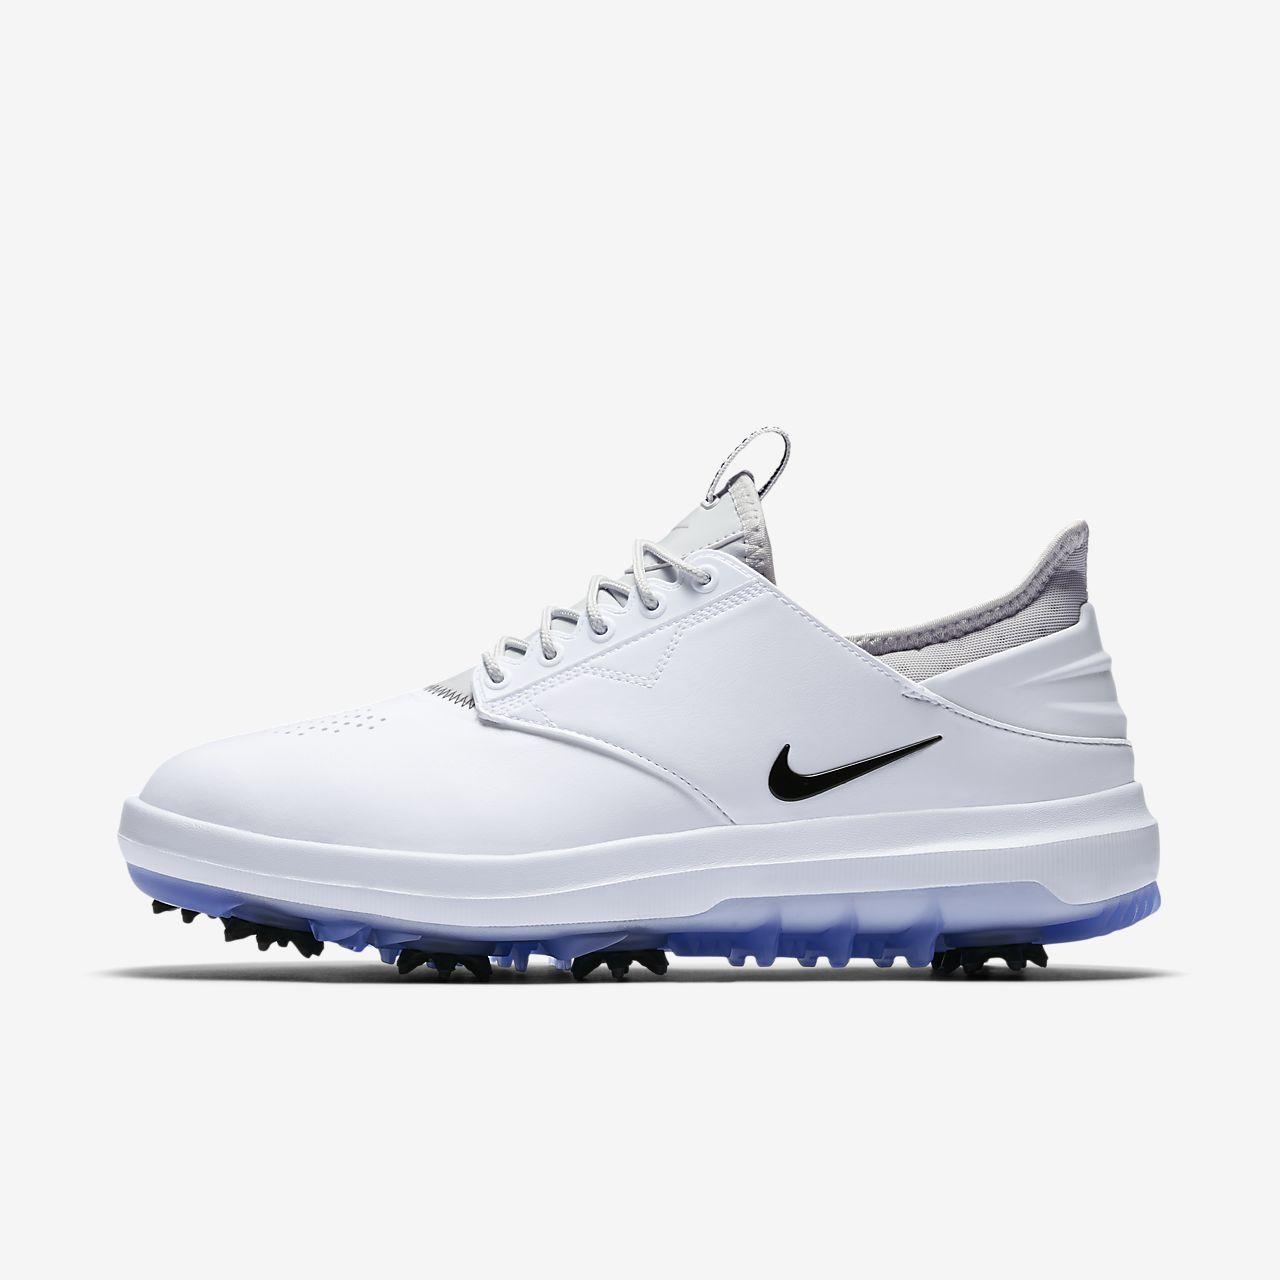 official photos 832e3 8f38c ... Golfsko Nike Air Zoom Direct för män